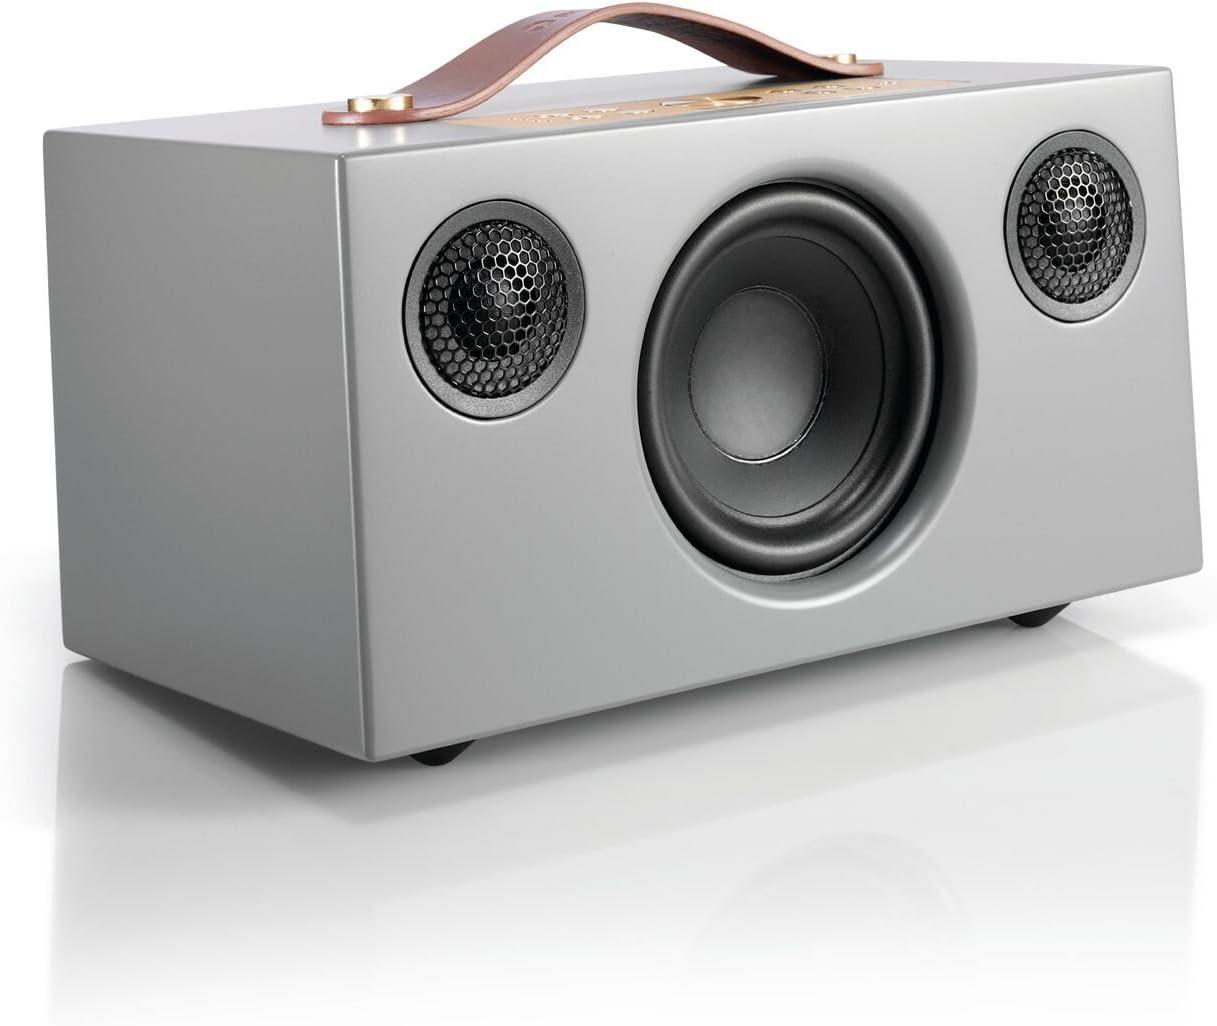 Pequeño Altavoz Bluetooth Inalámbrico Portátil Multiroom Potente - Speaker Hi-Fi con Conexión WiFi, Apple Air Play, Spotify Connect - Audio Pro Addon C5 - Gris